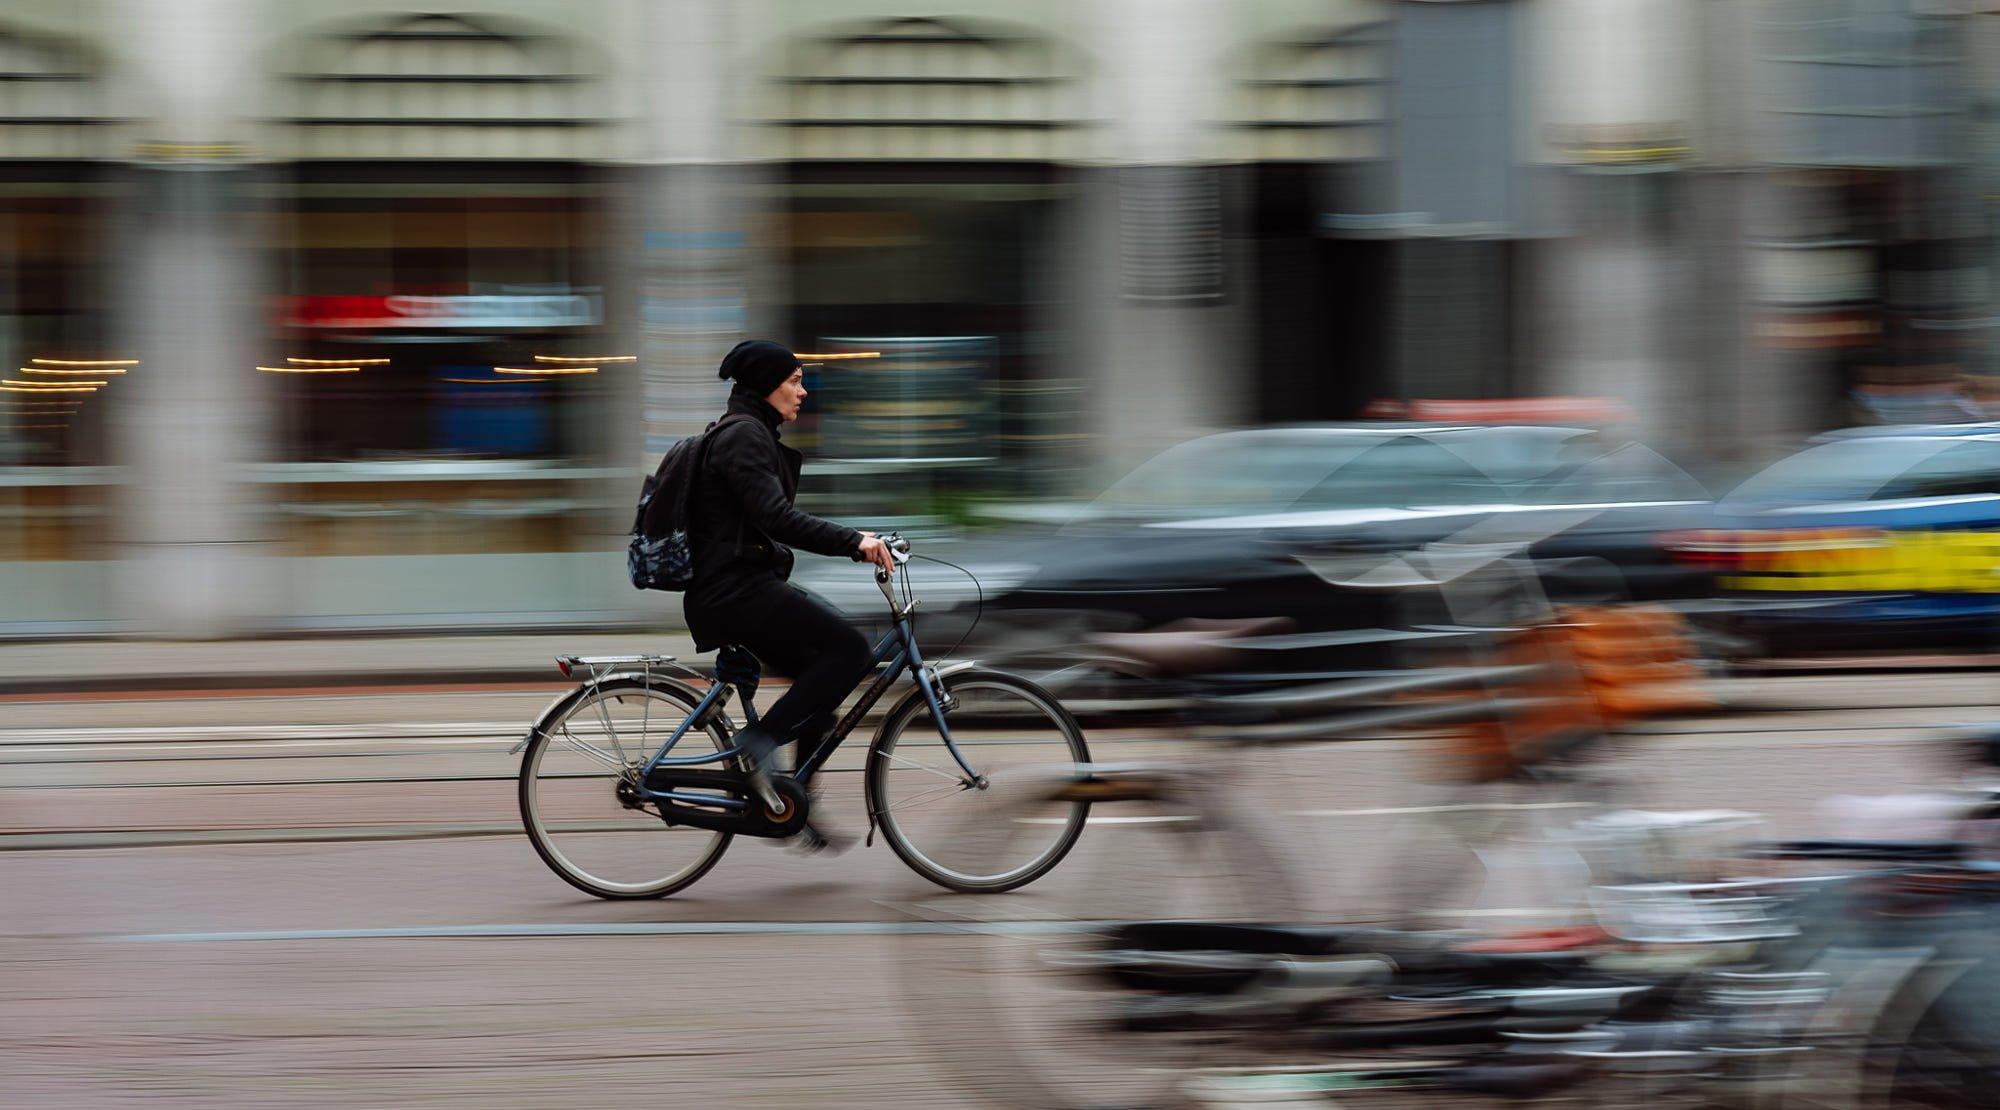 амстердам, amsterdam, netherlands, голландия, велосипед, движение, скорость, Александър Киричев